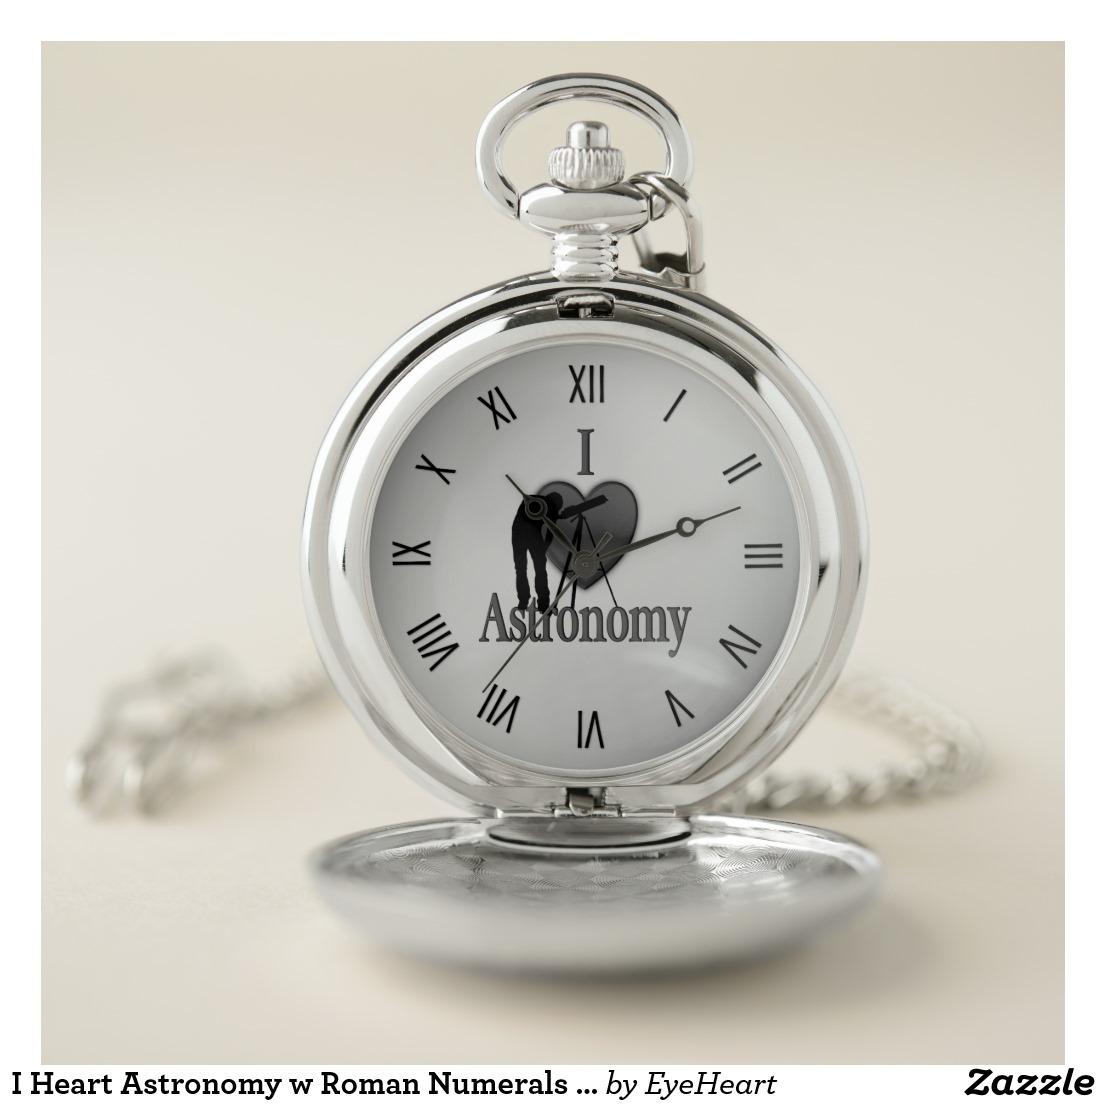 I Heart Astronomy w Roman Numerals Silver Pocket Watch